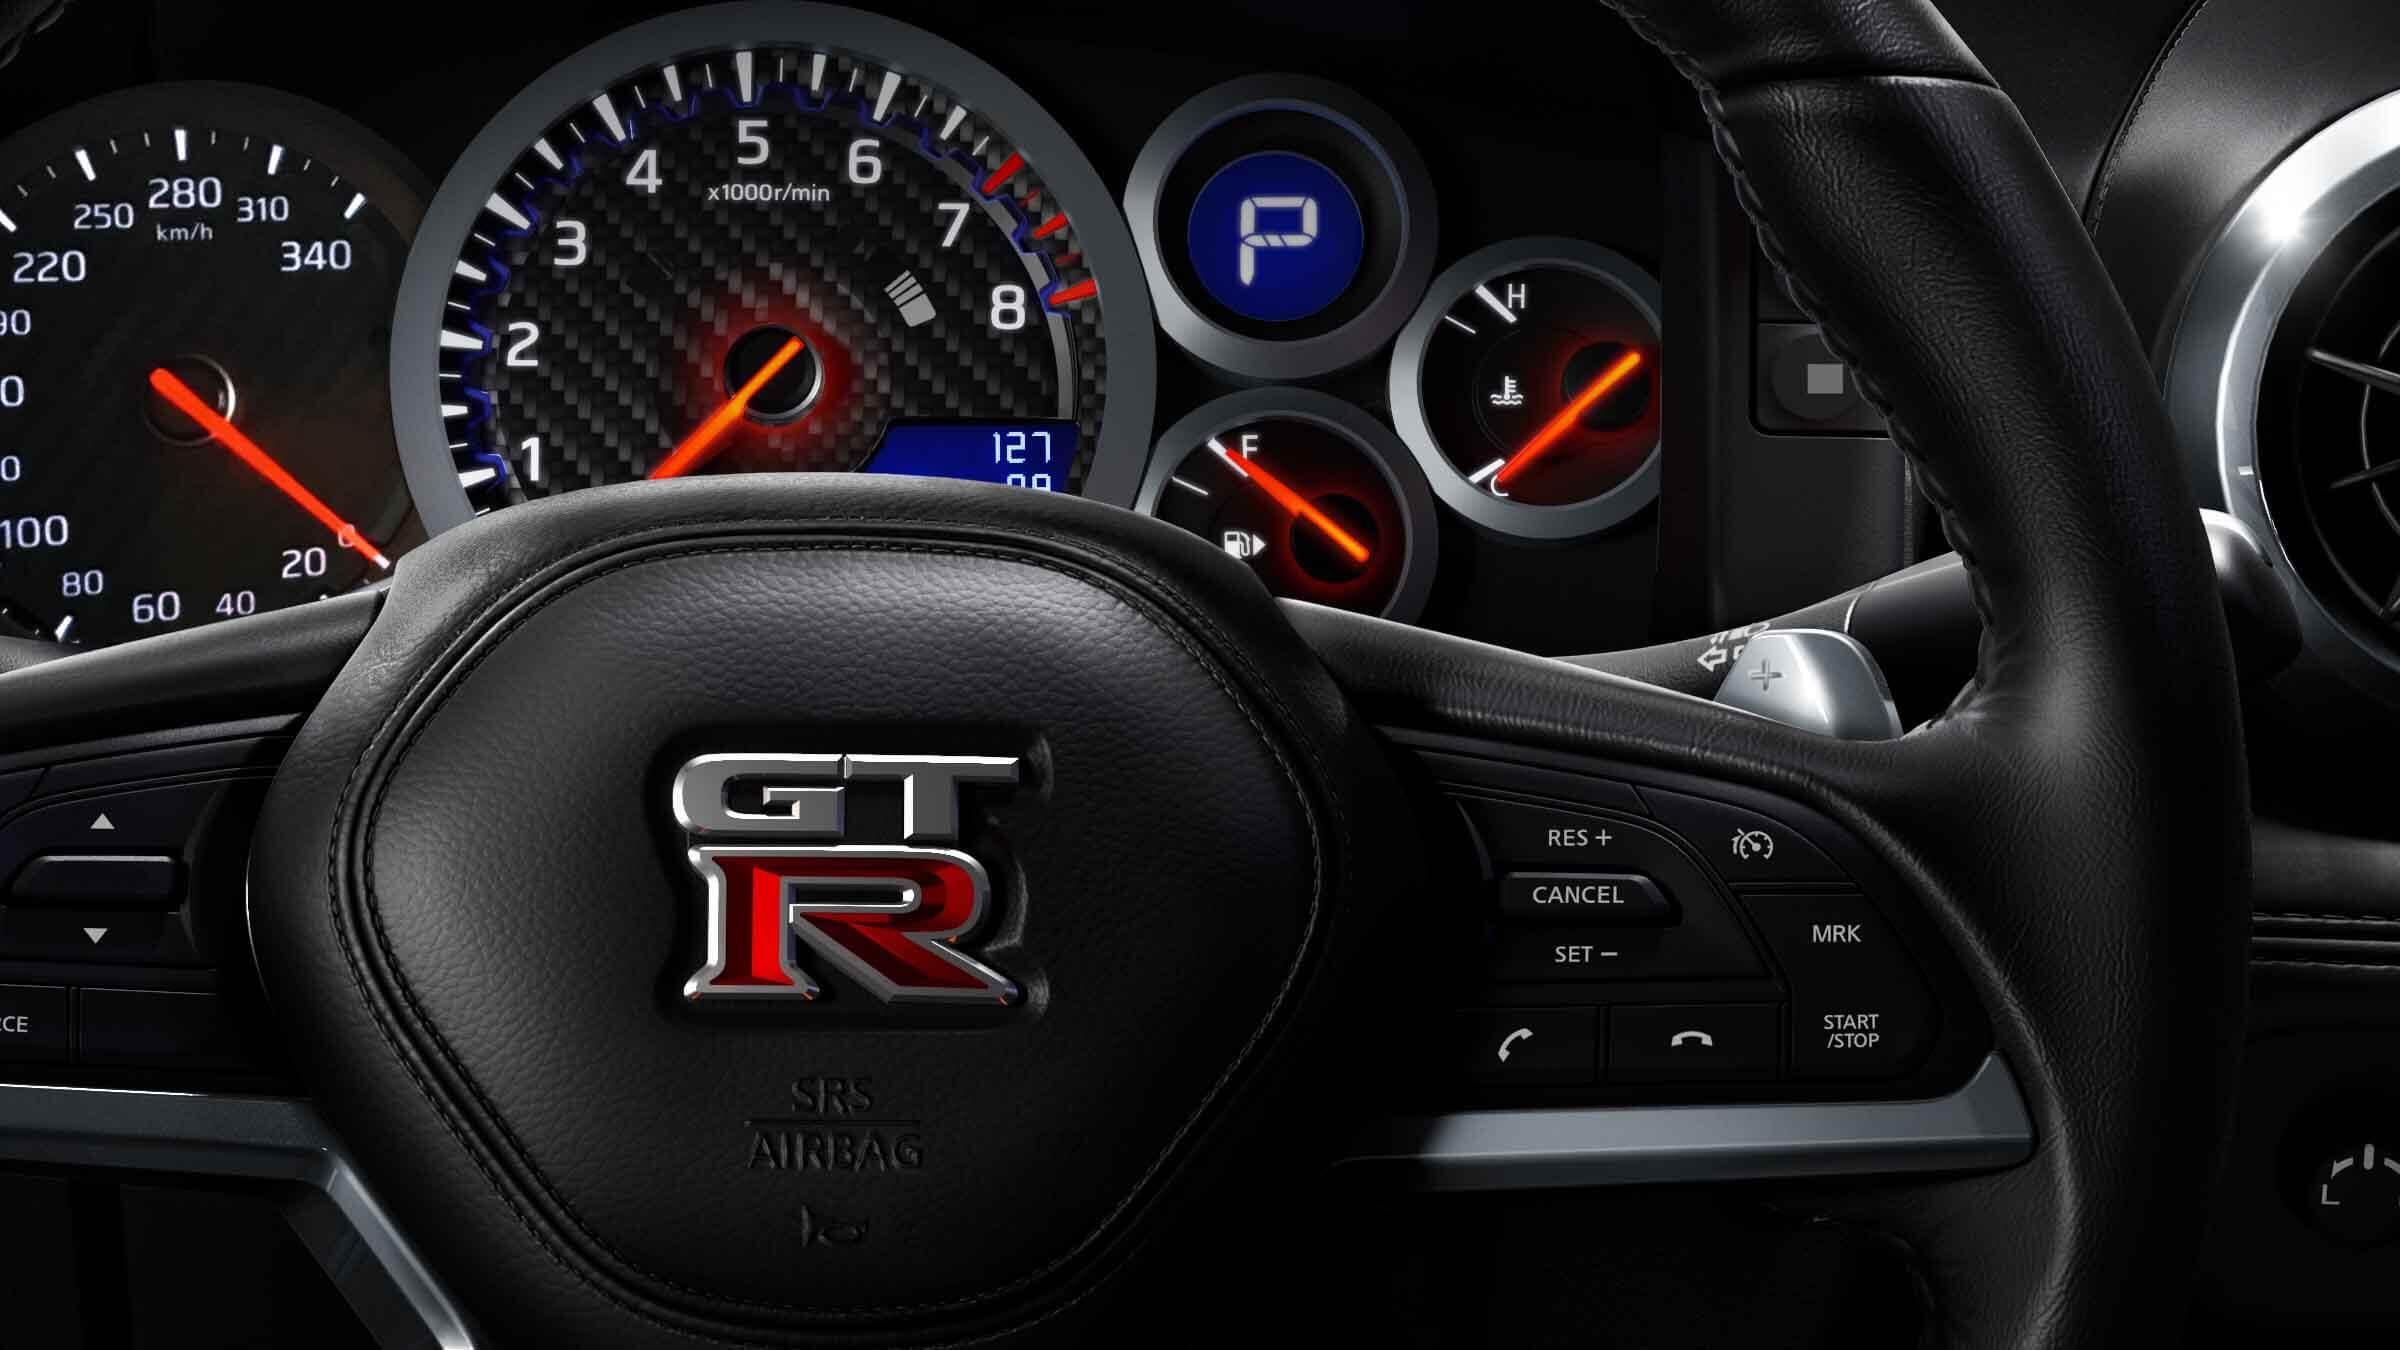 GT-R 19 50th Anniversary